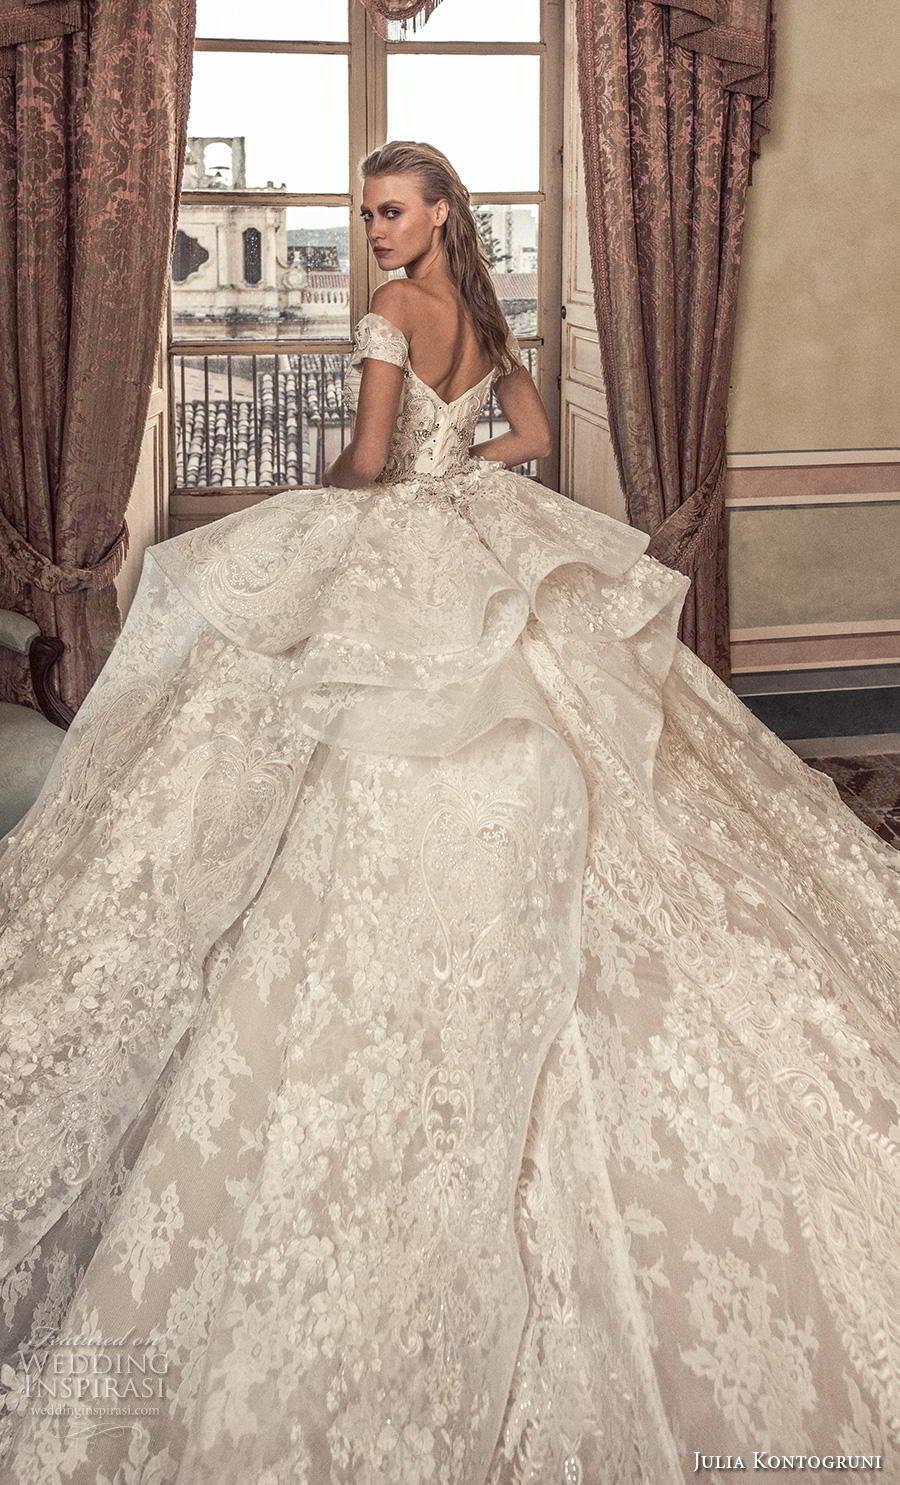 julia kontogruni 2019 bridal off the shoulder sweetheart neckline full embellishment layered skirt princess ball gown a  line wedding dress mid back royal train (10) zbv